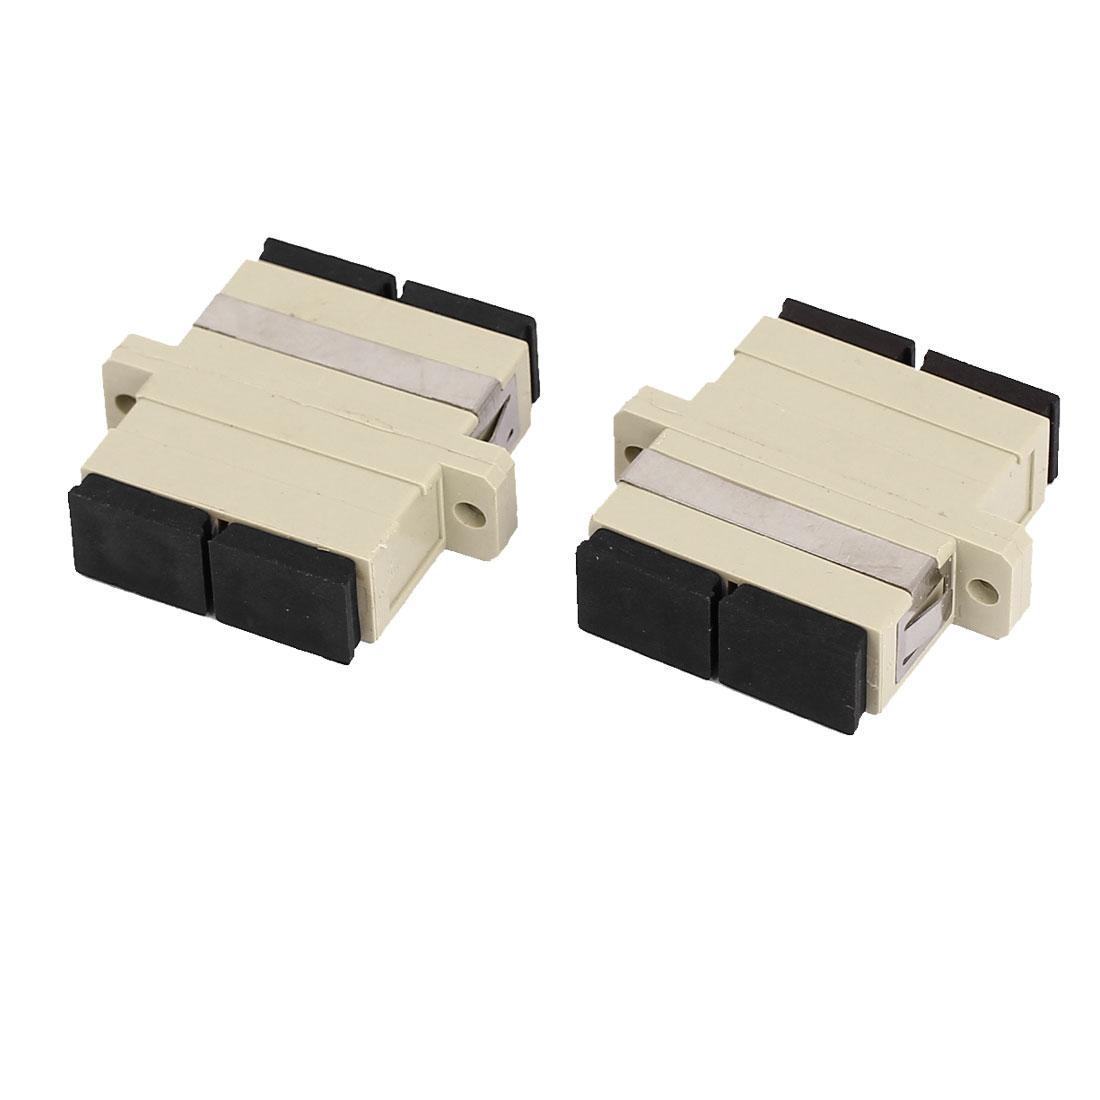 SC/SC Duplex Multimode Flange Fiber Optical Connector Adapter Coupler 2Pcs